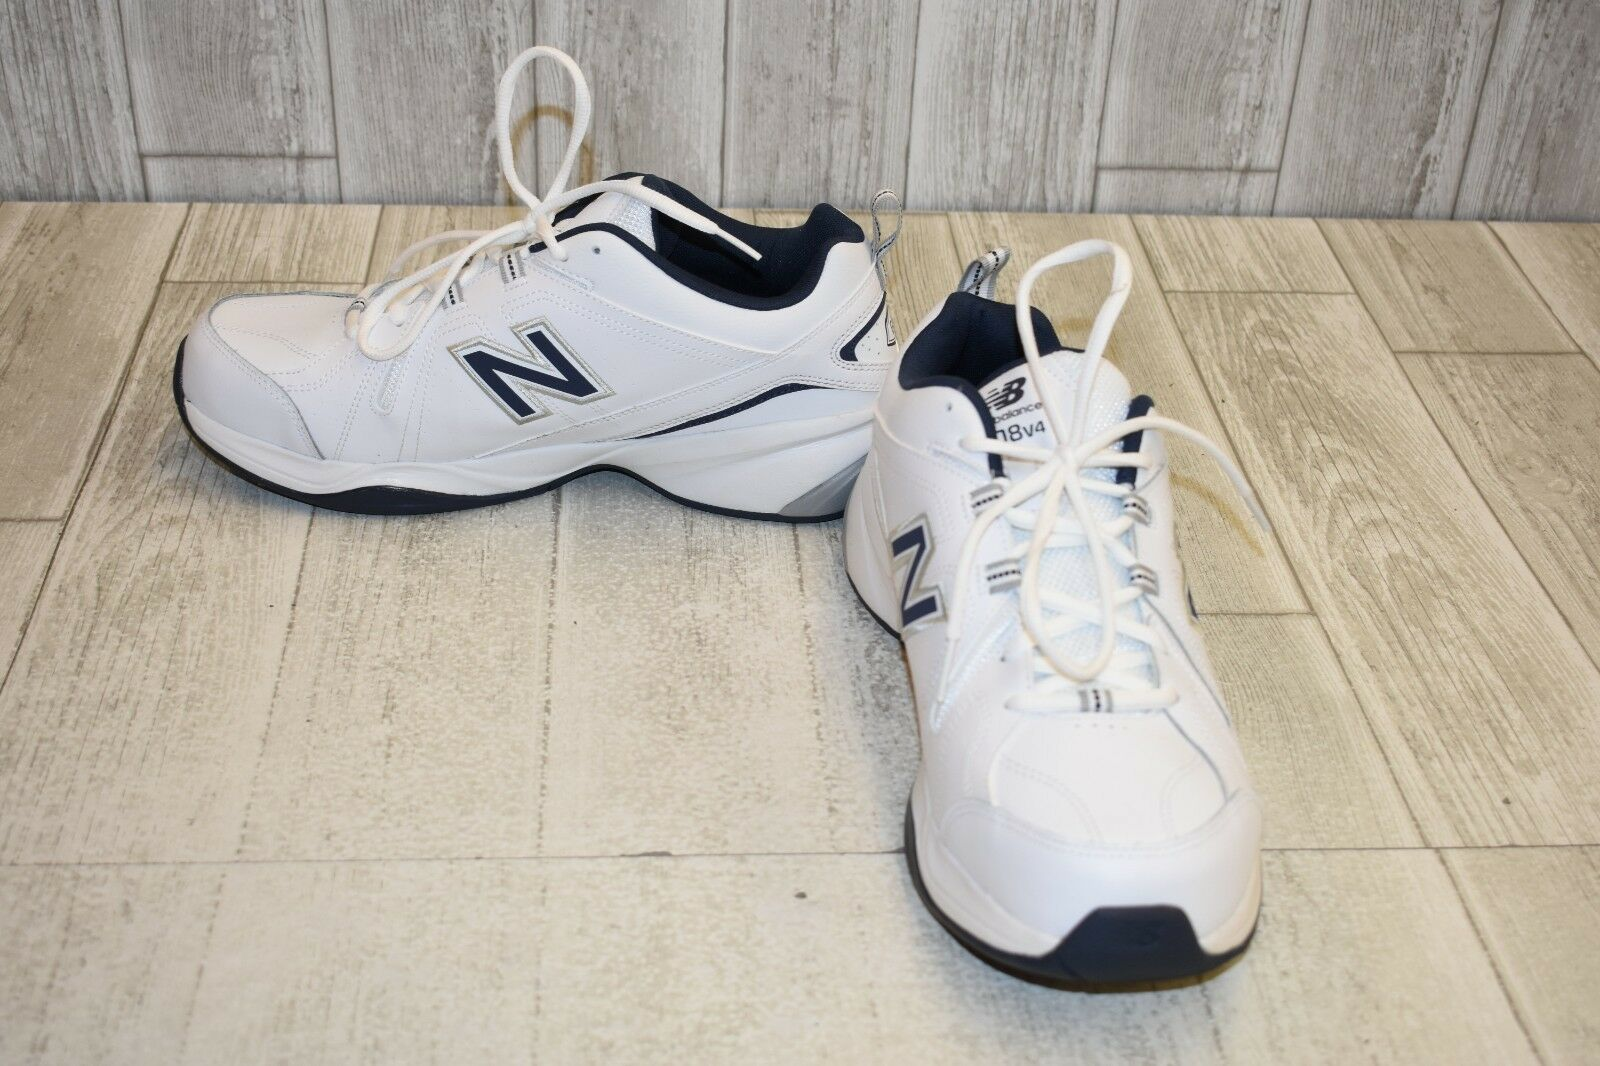 New Balance 608v8 Training shoes - Men's Size 12 4E - White Navy